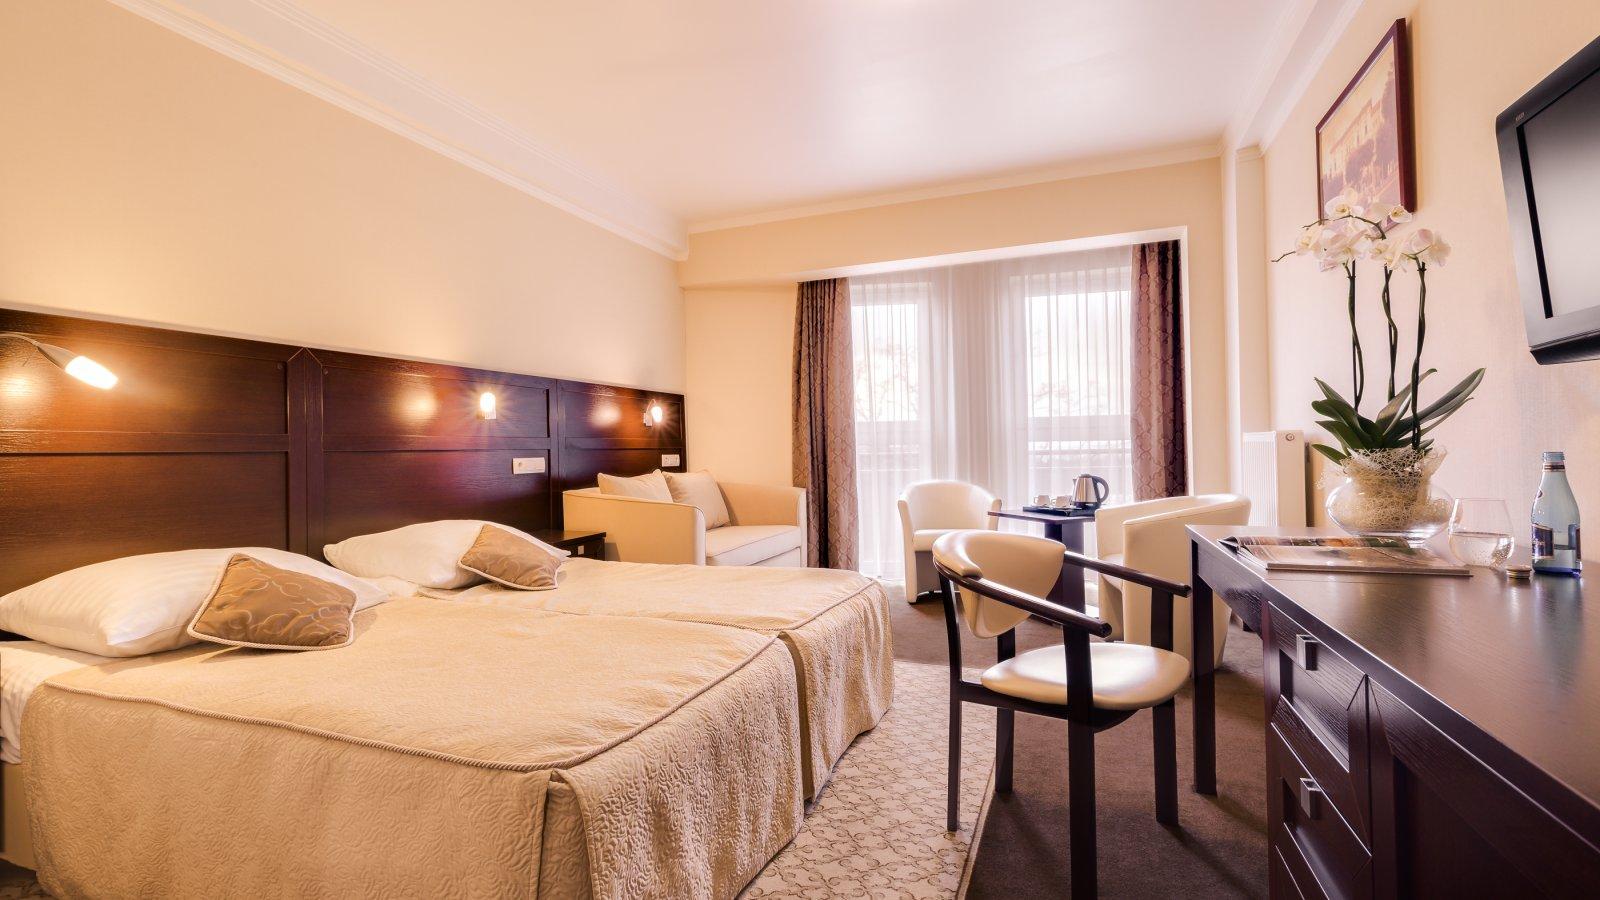 Hotell Aurora room-6